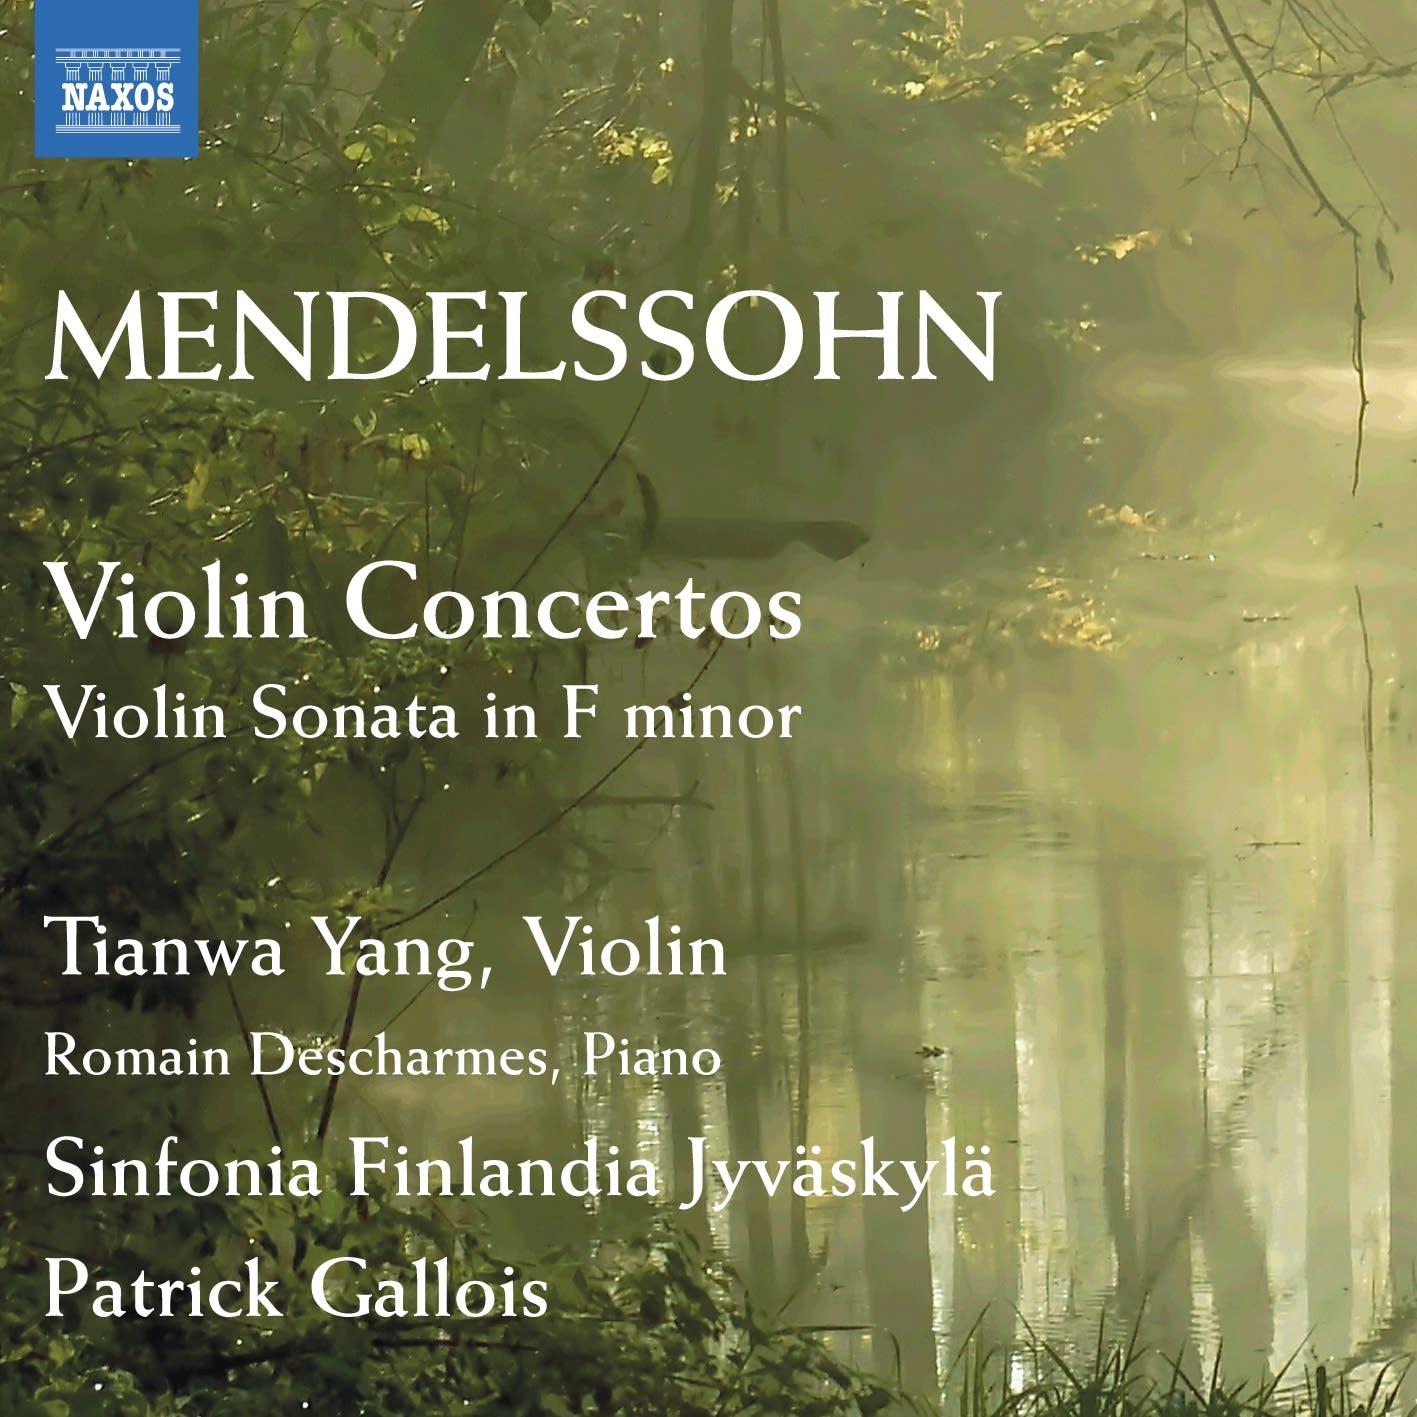 Felix Mendelssohn - Violin Sonata: II. Poco adagio